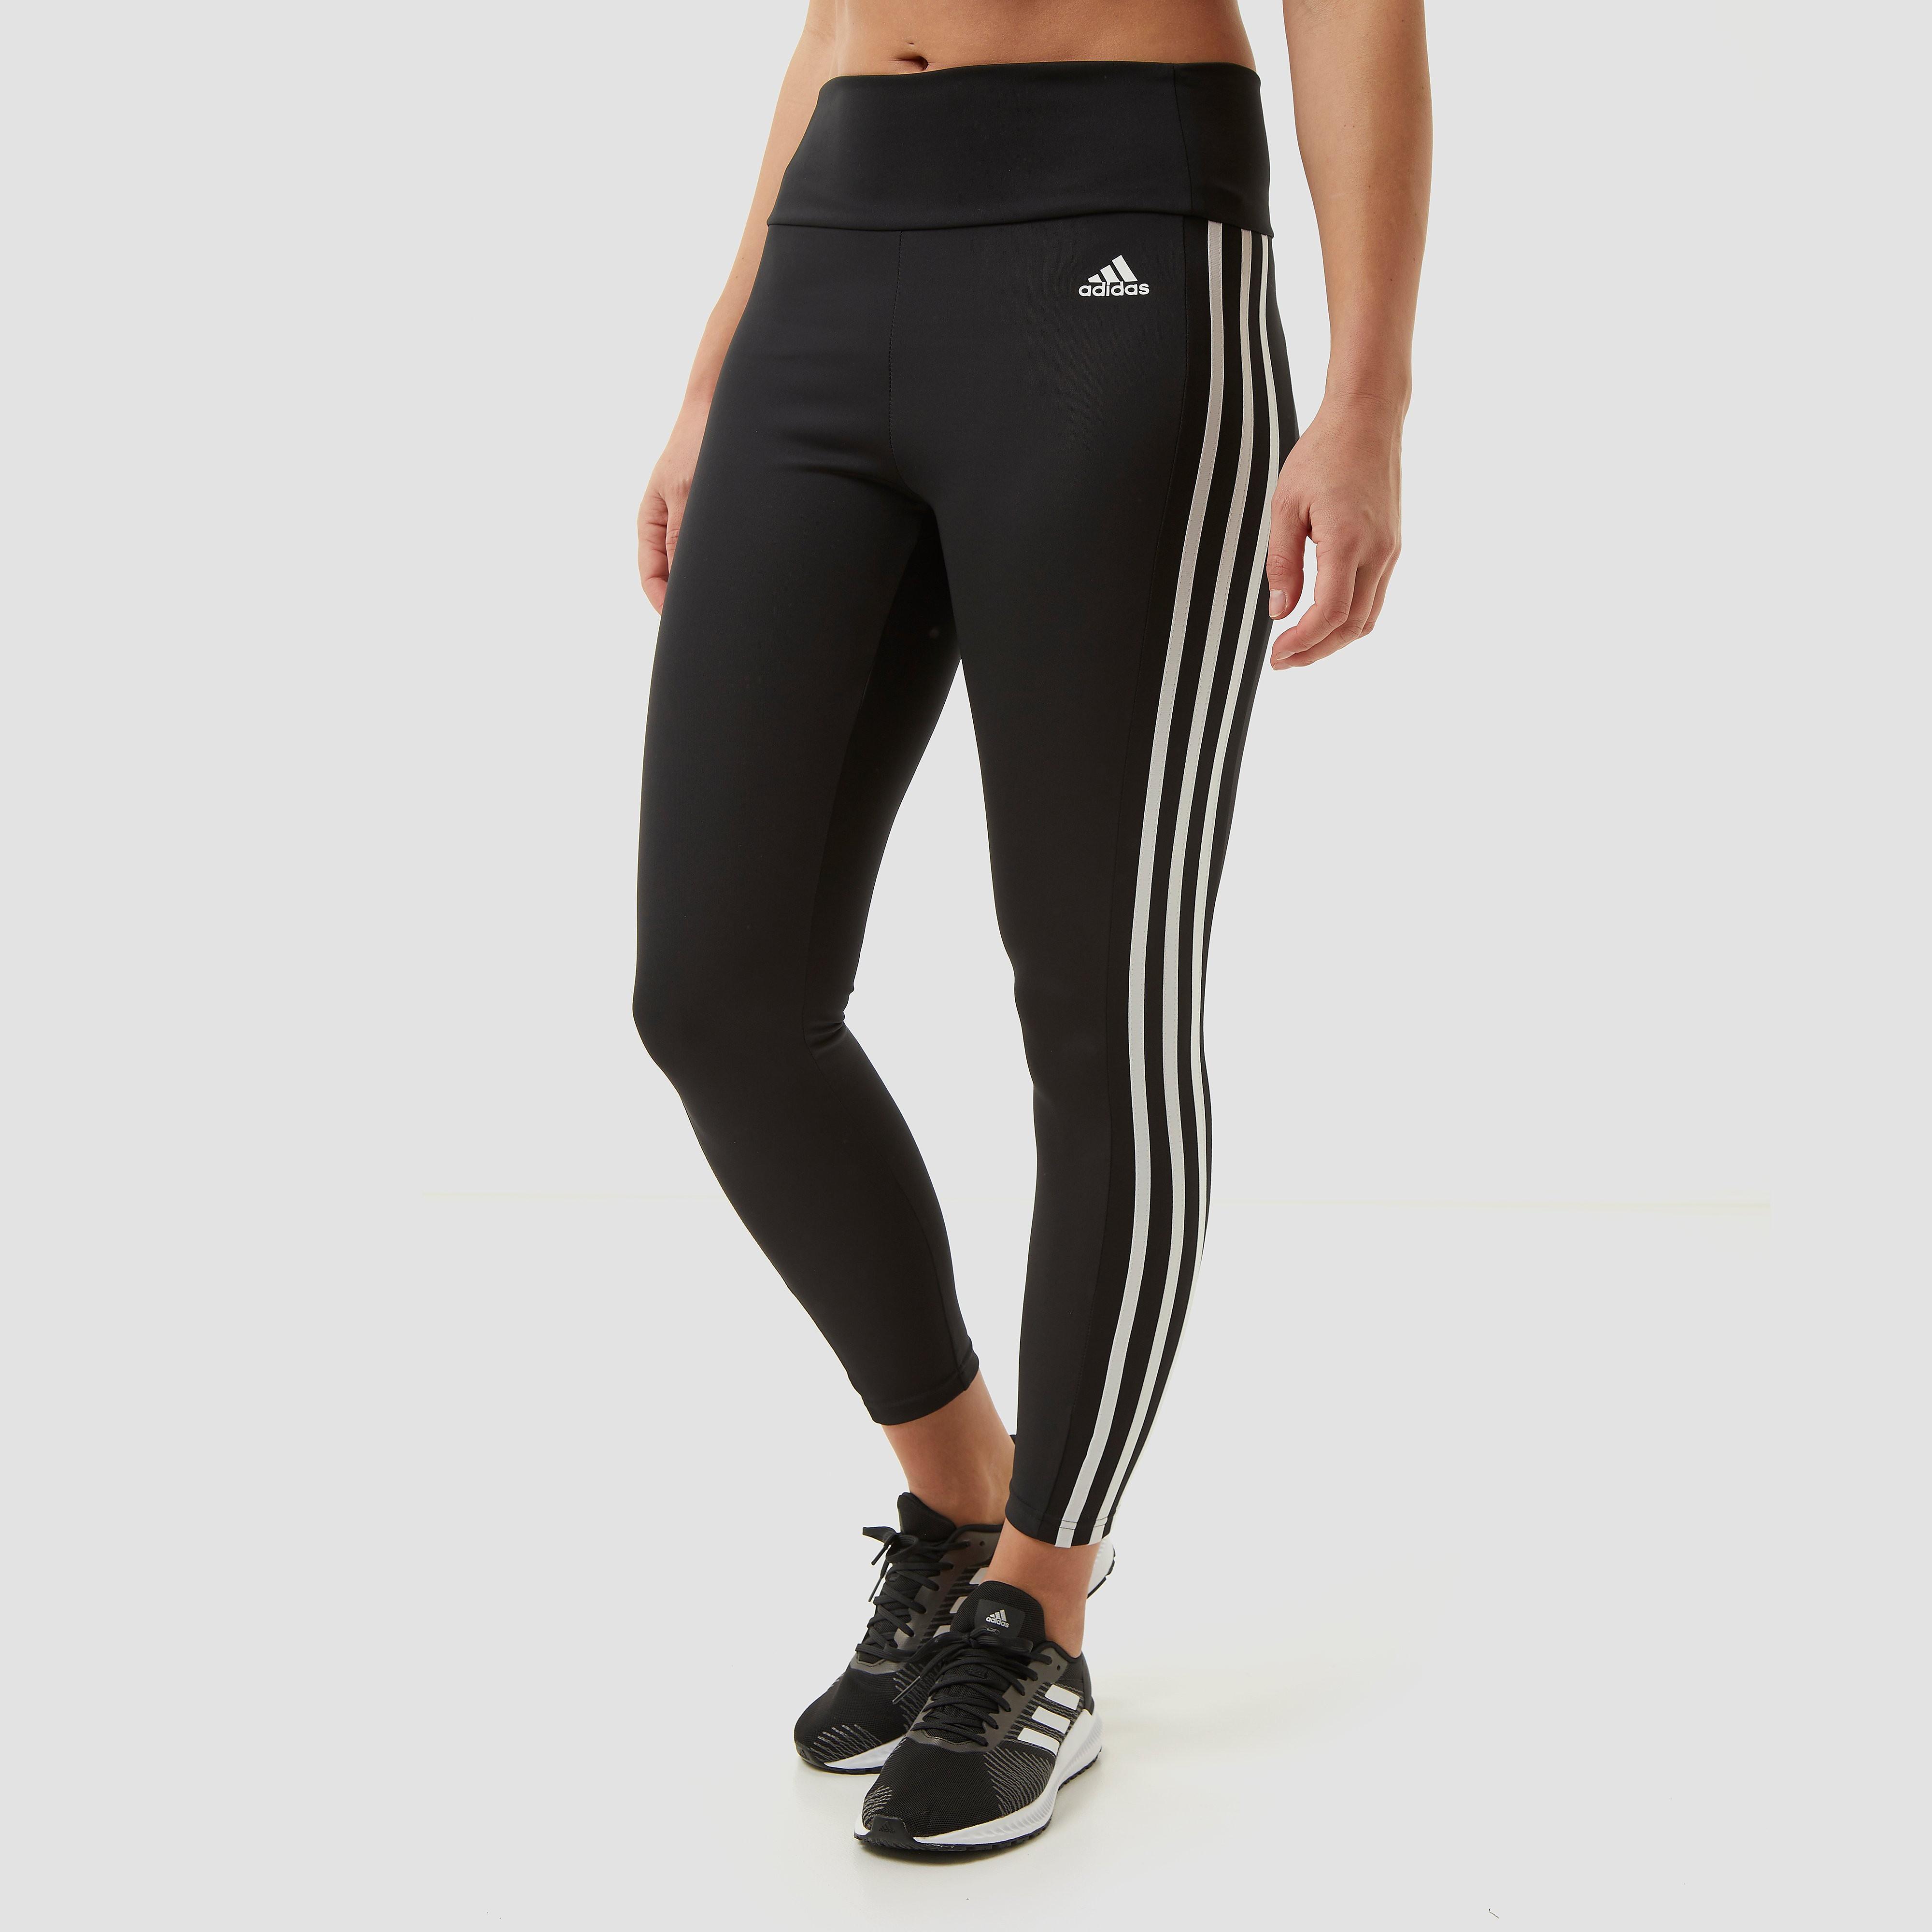 adidas Adidas 3-stripes 7/8 sporttight zwart dames dames